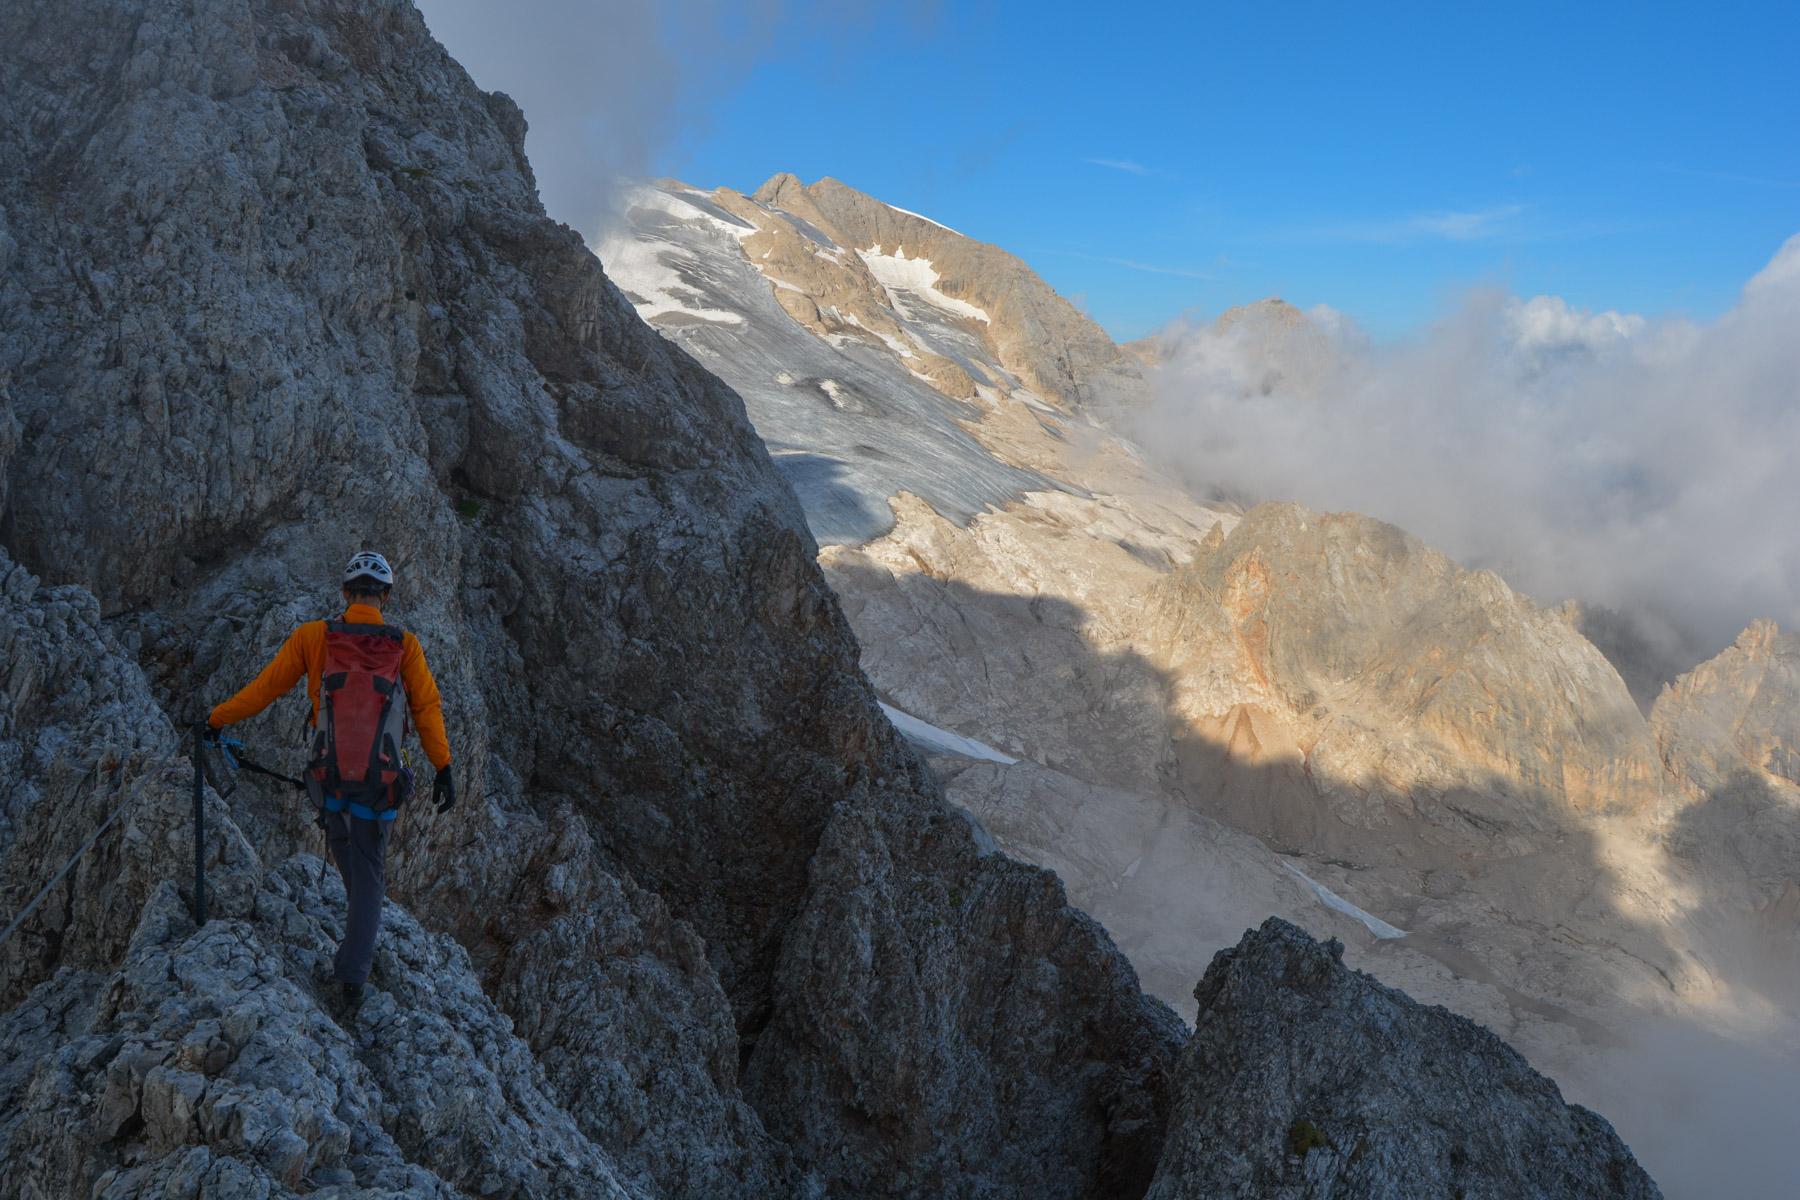 Via Eterna Brigata Cadore, Dolomites 19